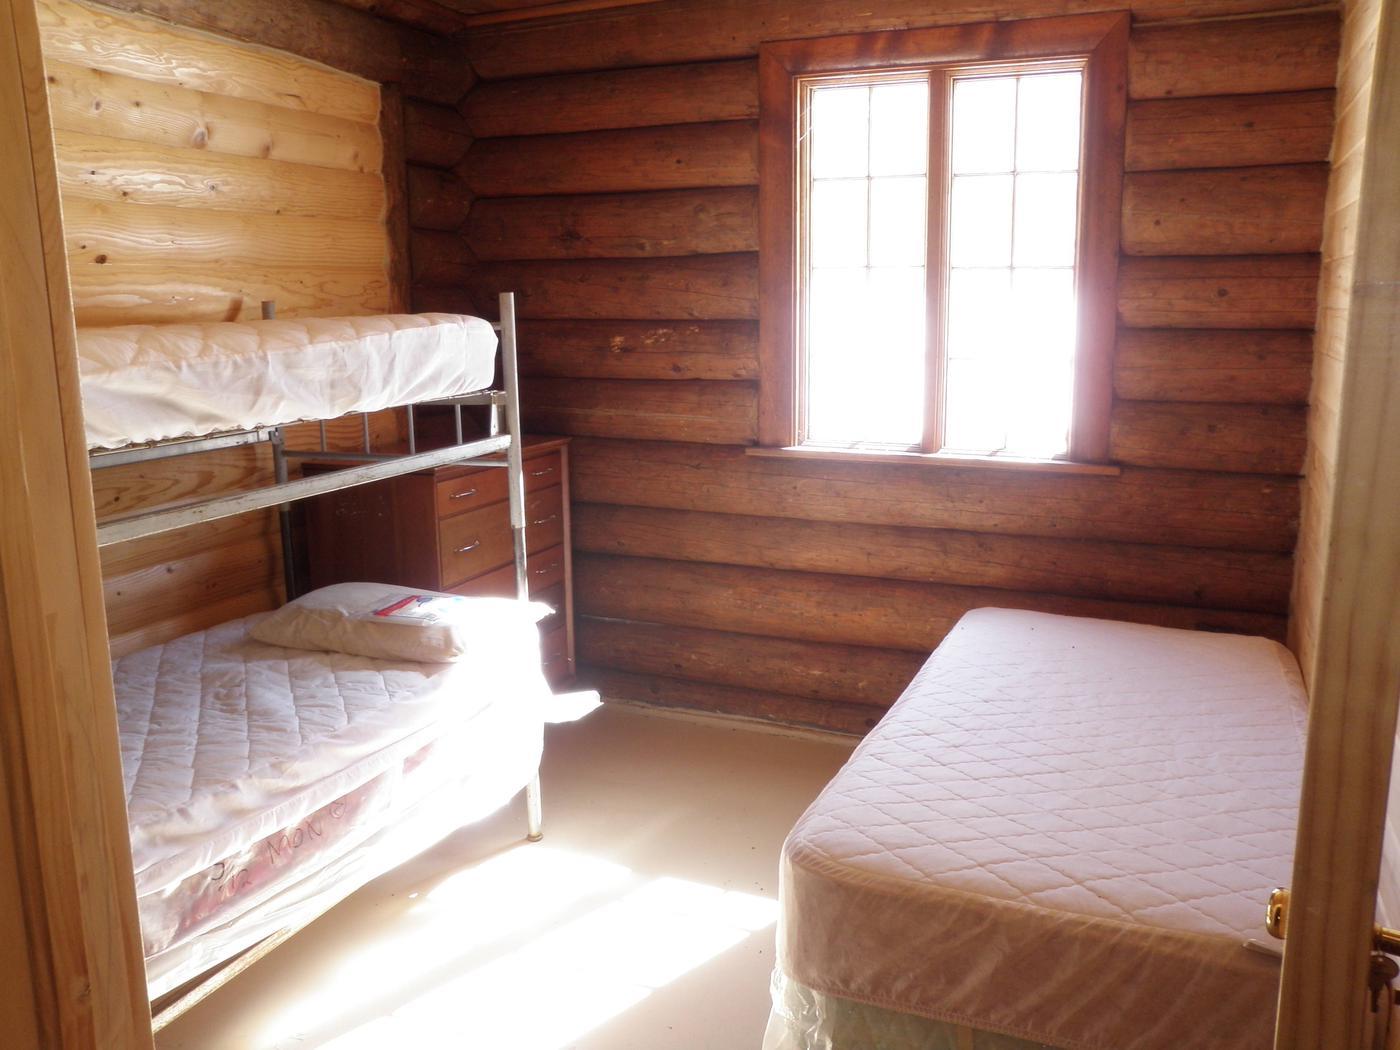 Photo of Lone Cone Cabin bedroomLone Cone Cabin bedroom